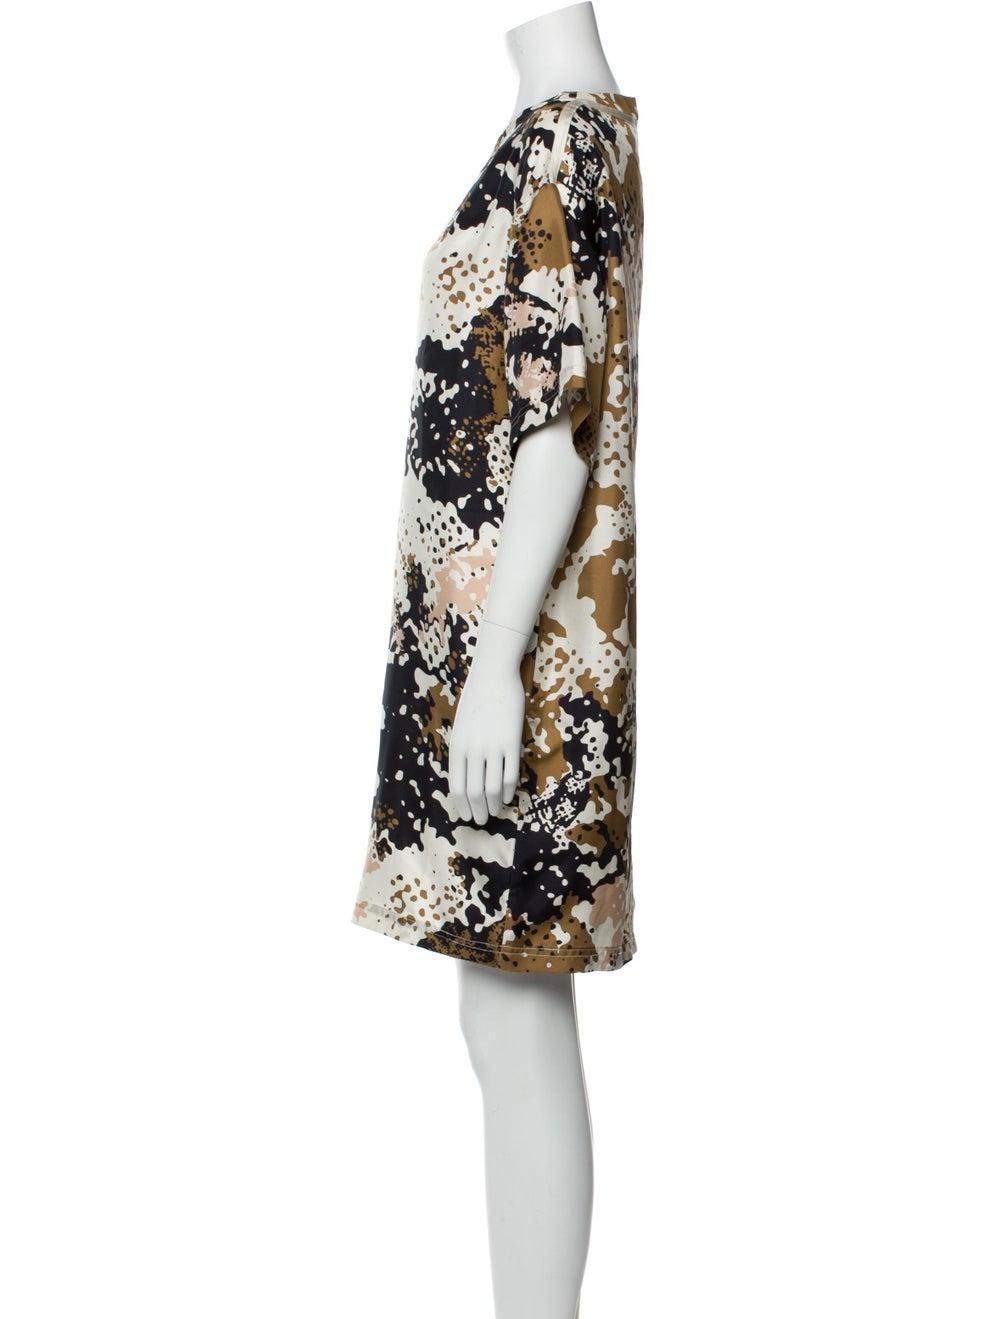 Rag & Bone Silk Mini Dress - image 2